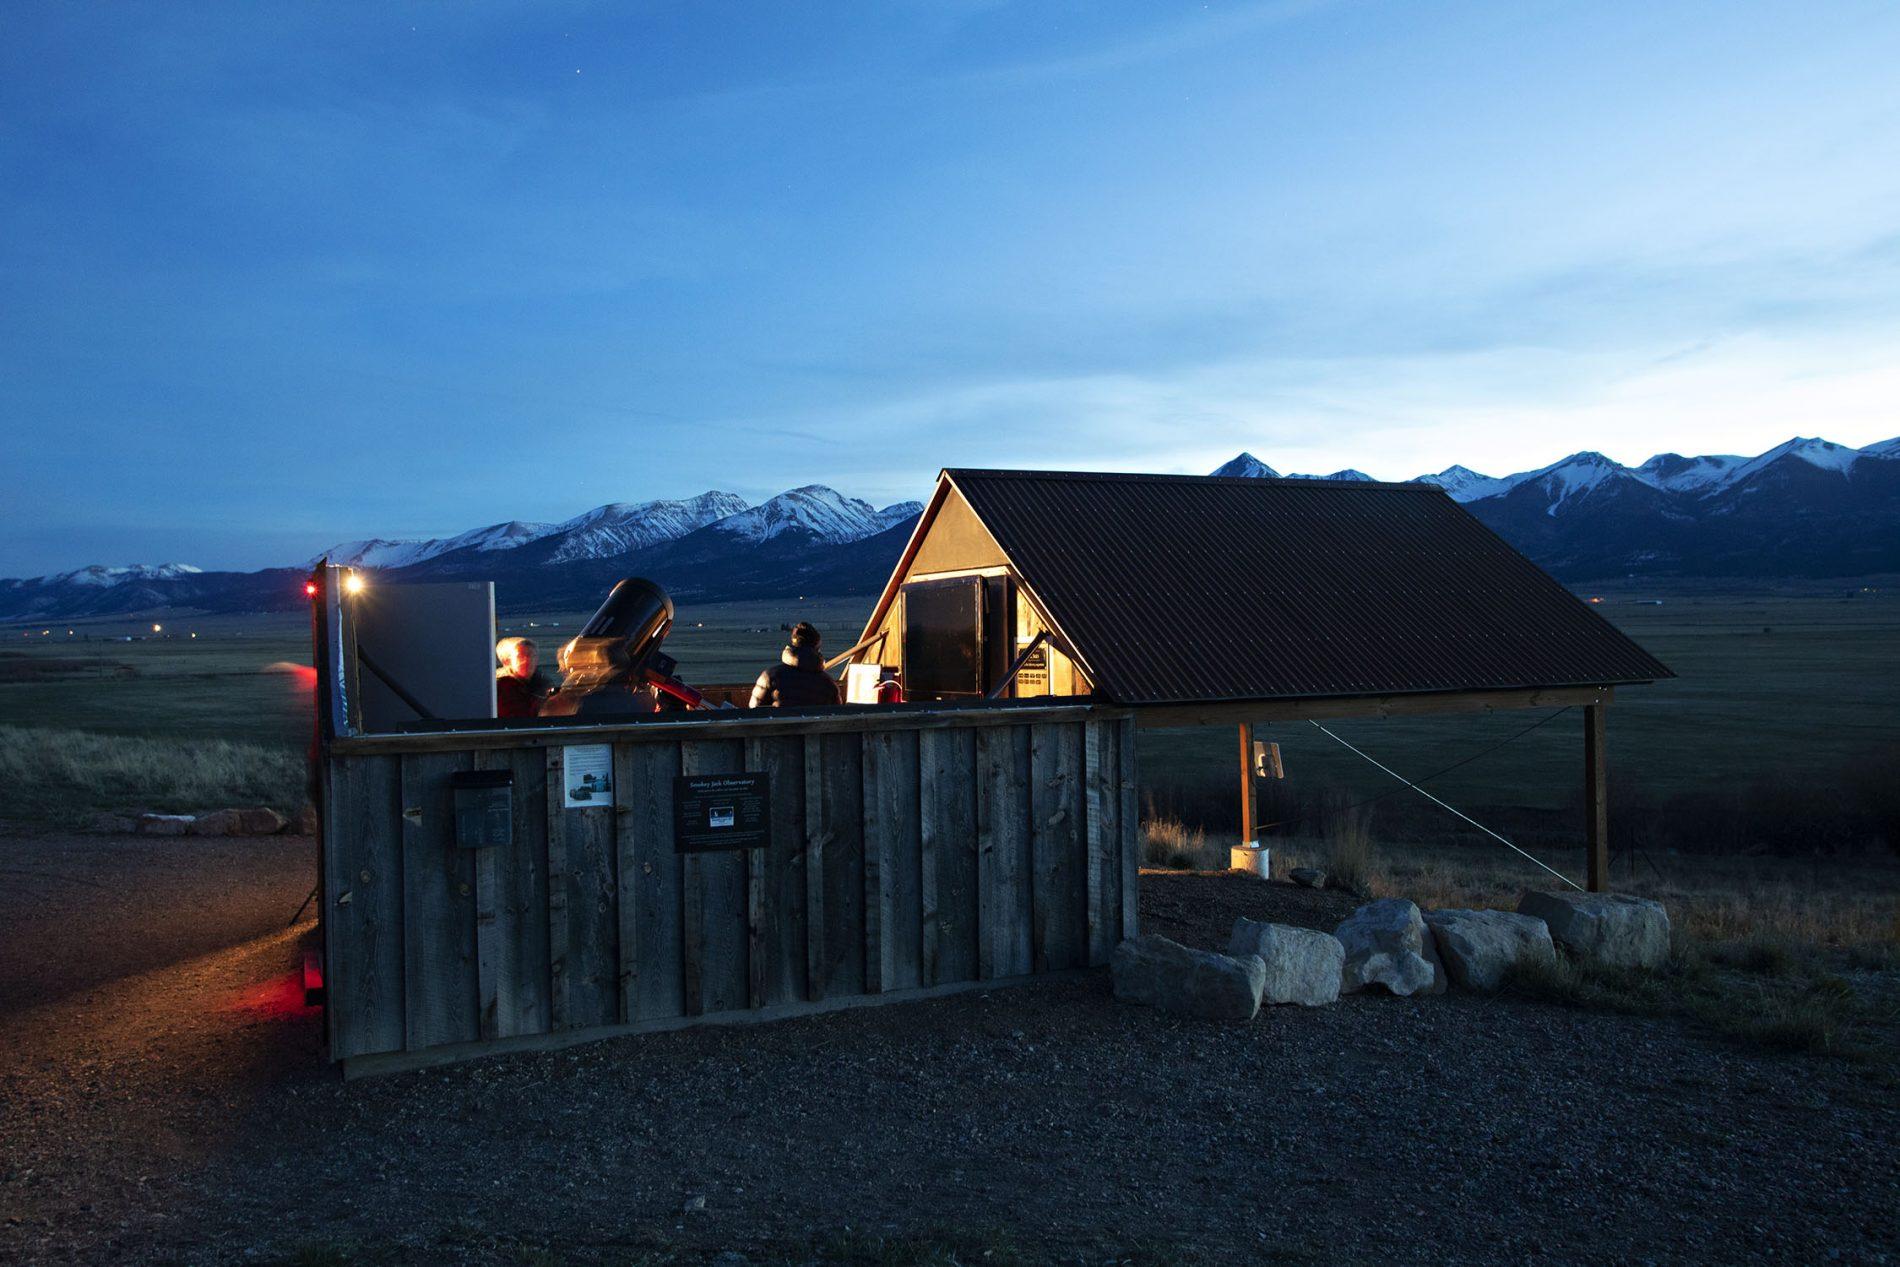 The Smokey Jack observatory and telescope at Westcliffe Colorado a Colorado Dark Skies community